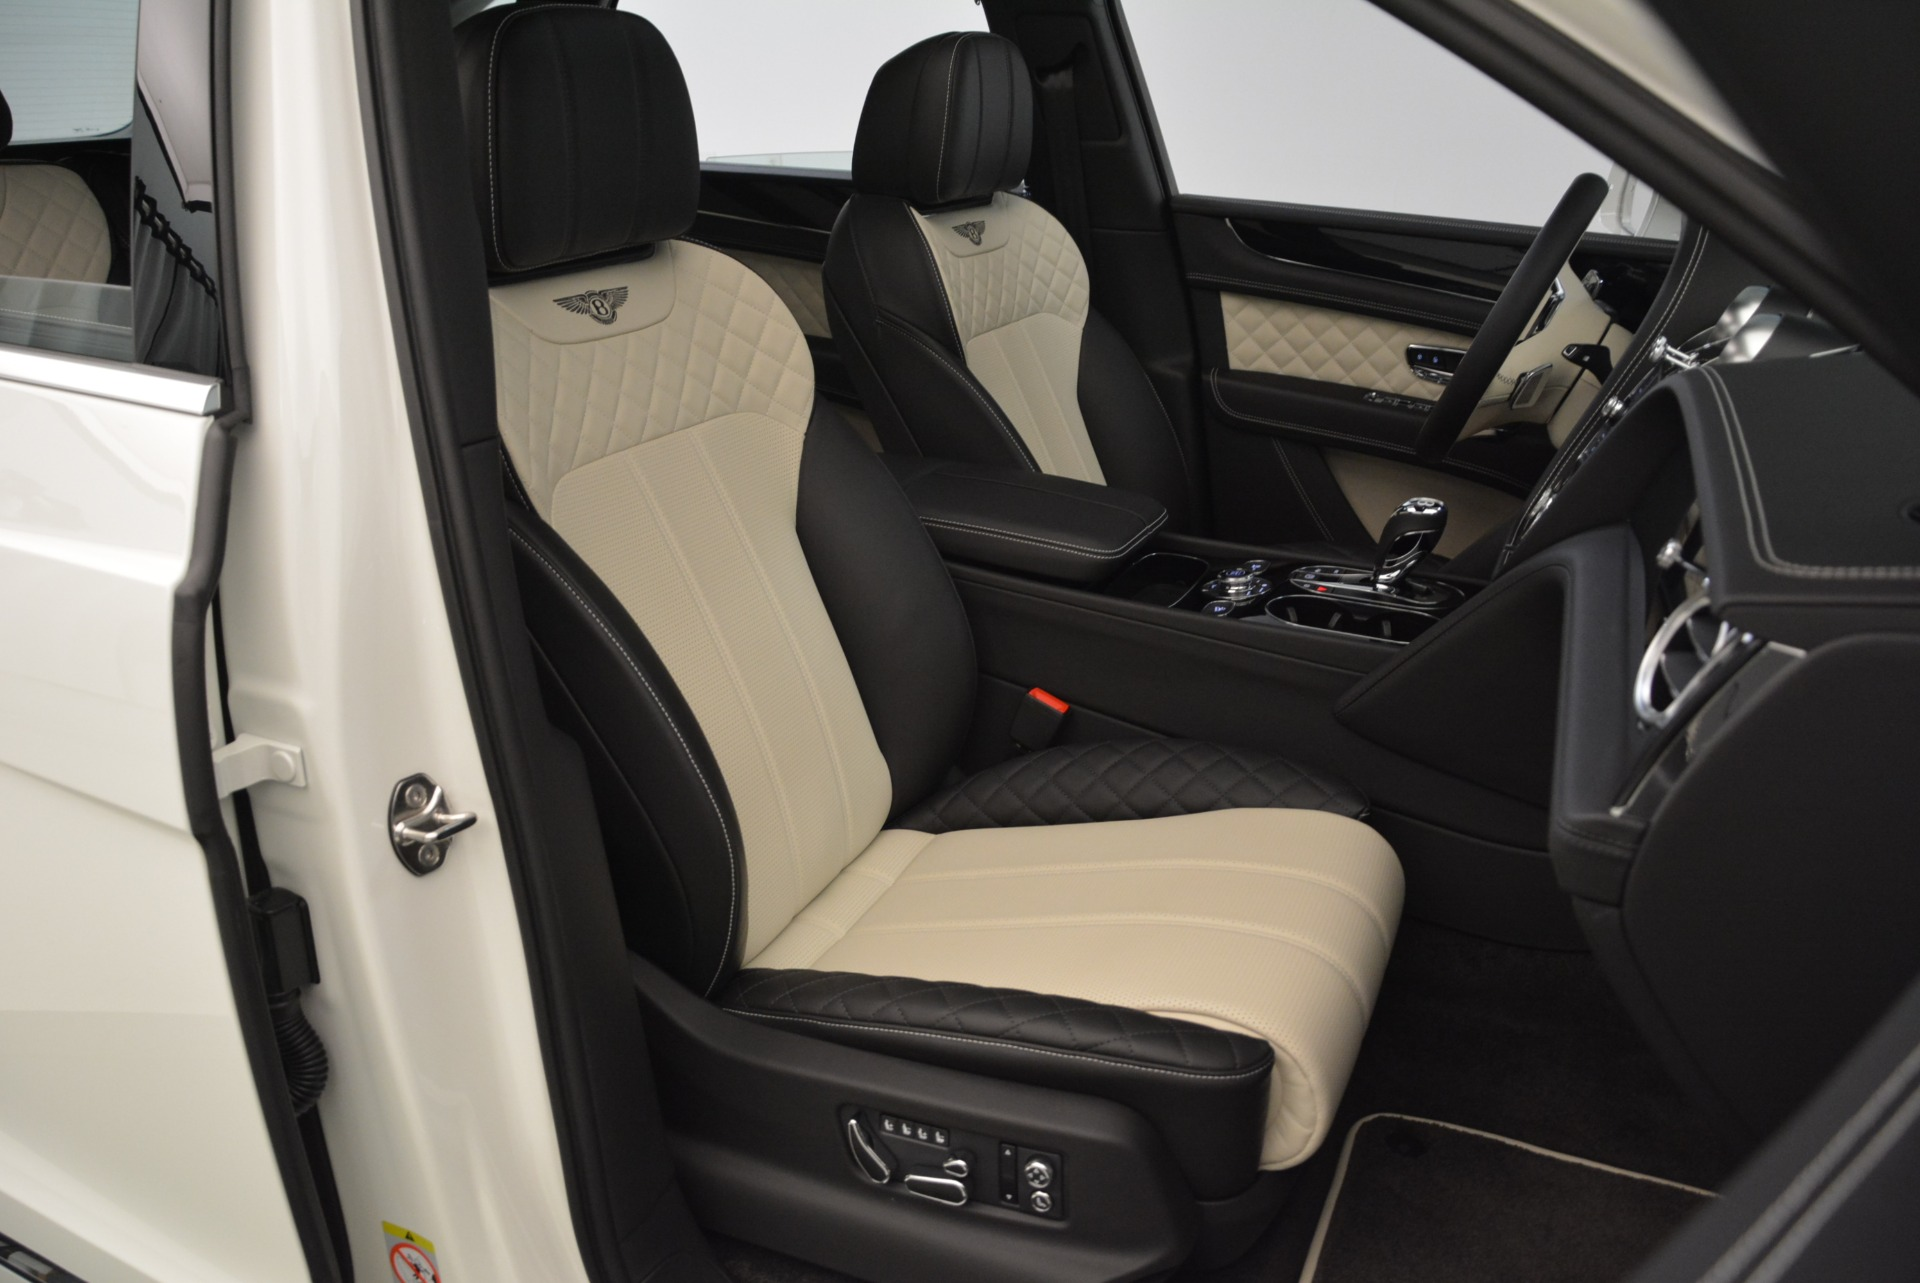 Used 2018 Bentley Bentayga Activity Edition For Sale In Westport, CT 1922_p25